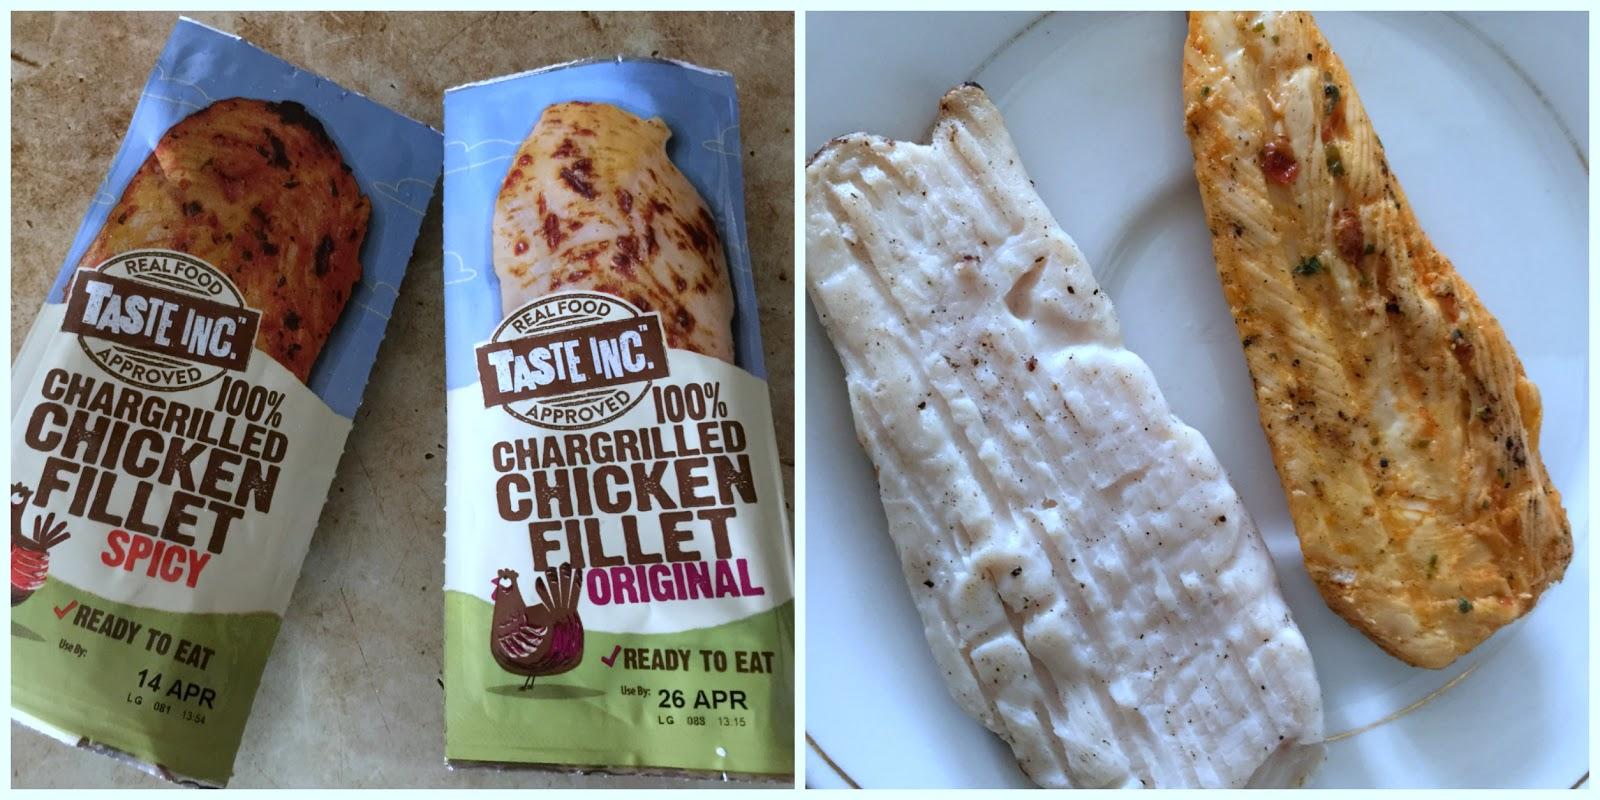 taste inc chicken fillet original and spicy review